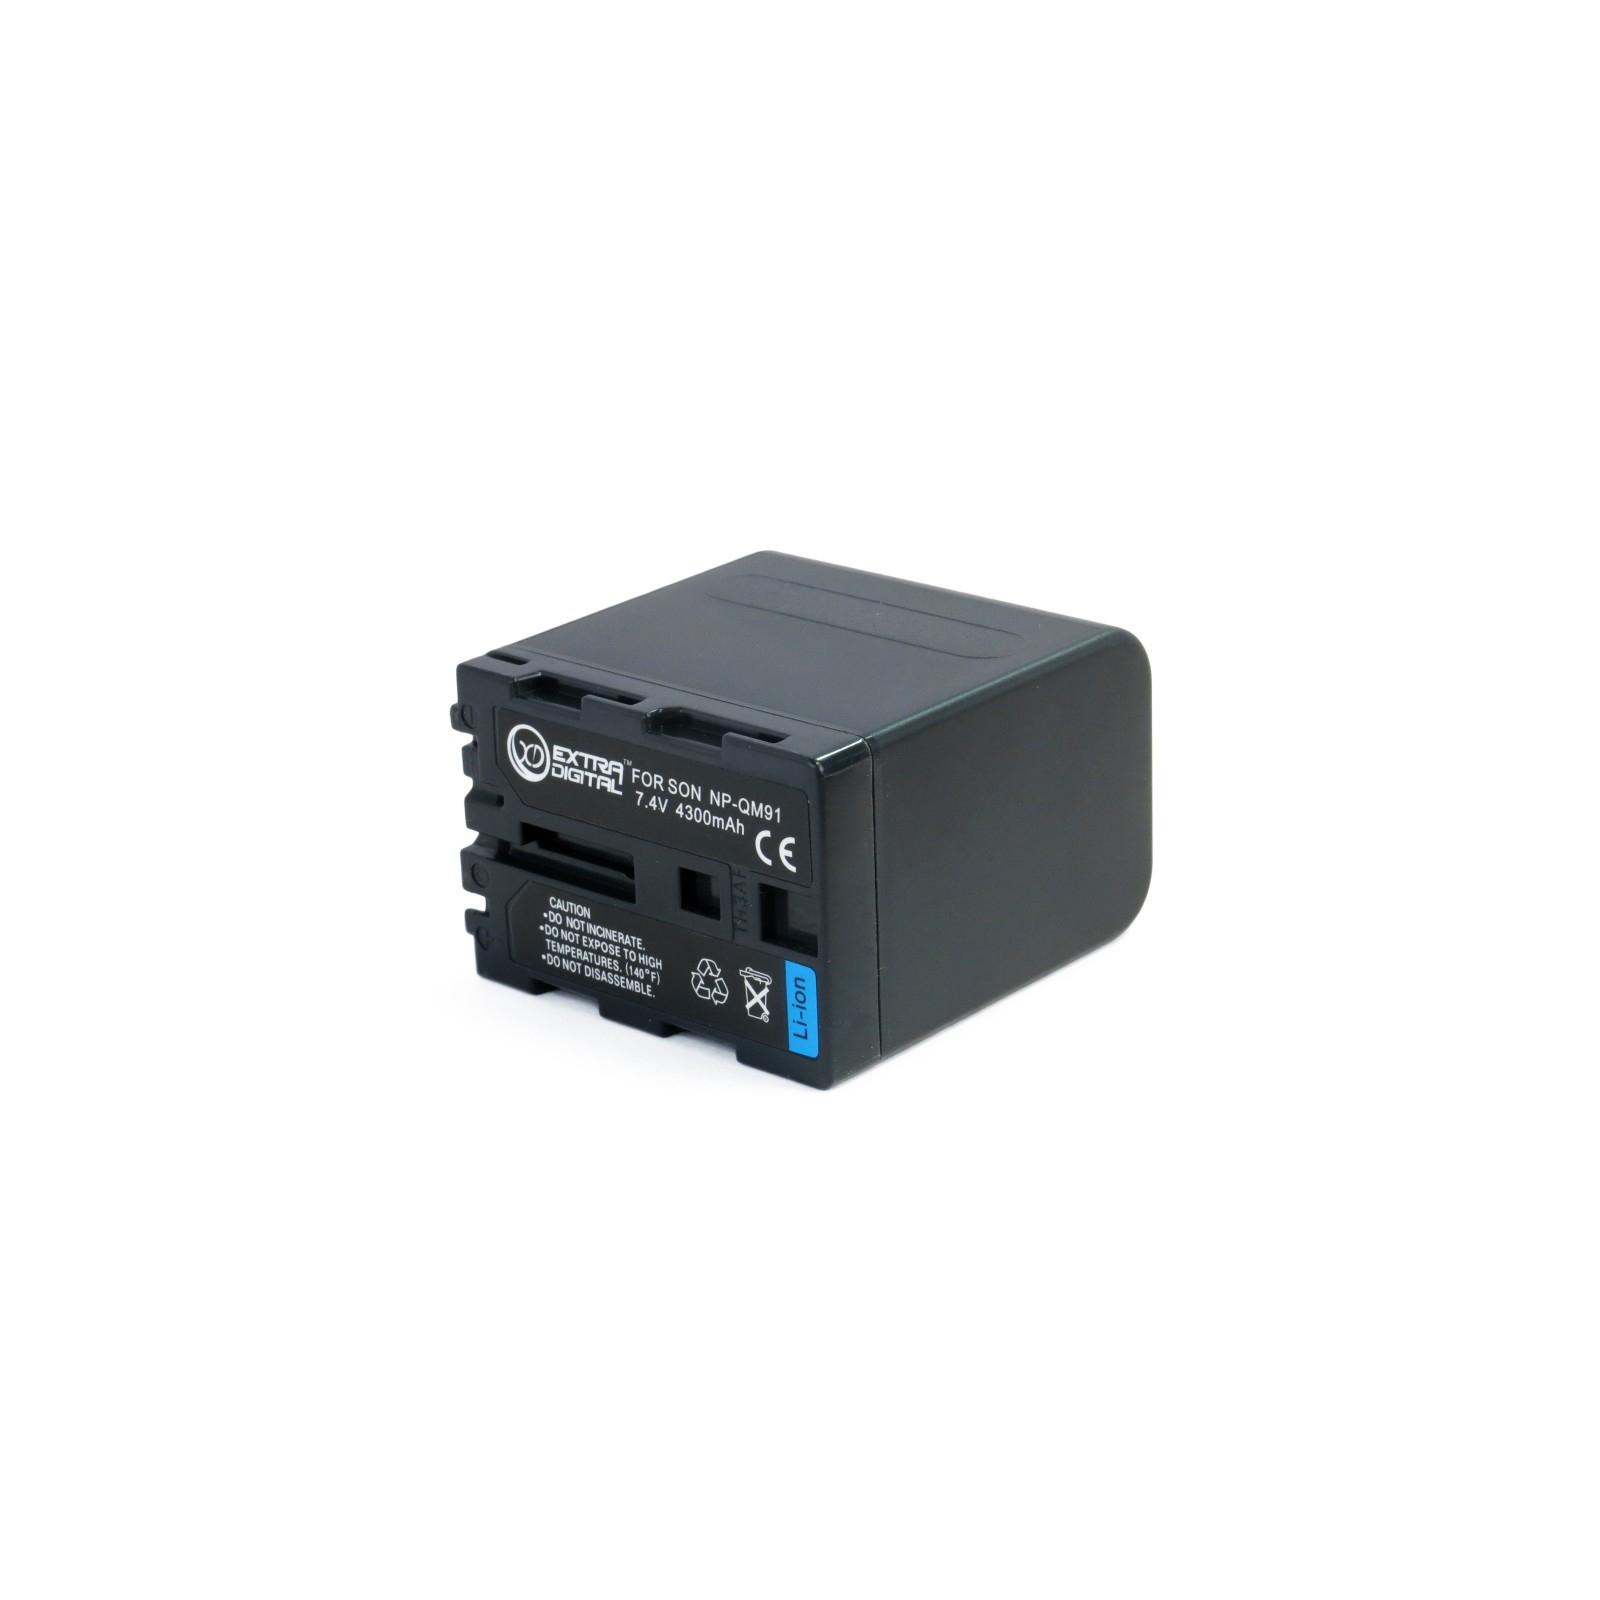 Аккумулятор к фото/видео EXTRADIGITAL Sony NP-QM91 (DV00DV1030) изображение 2